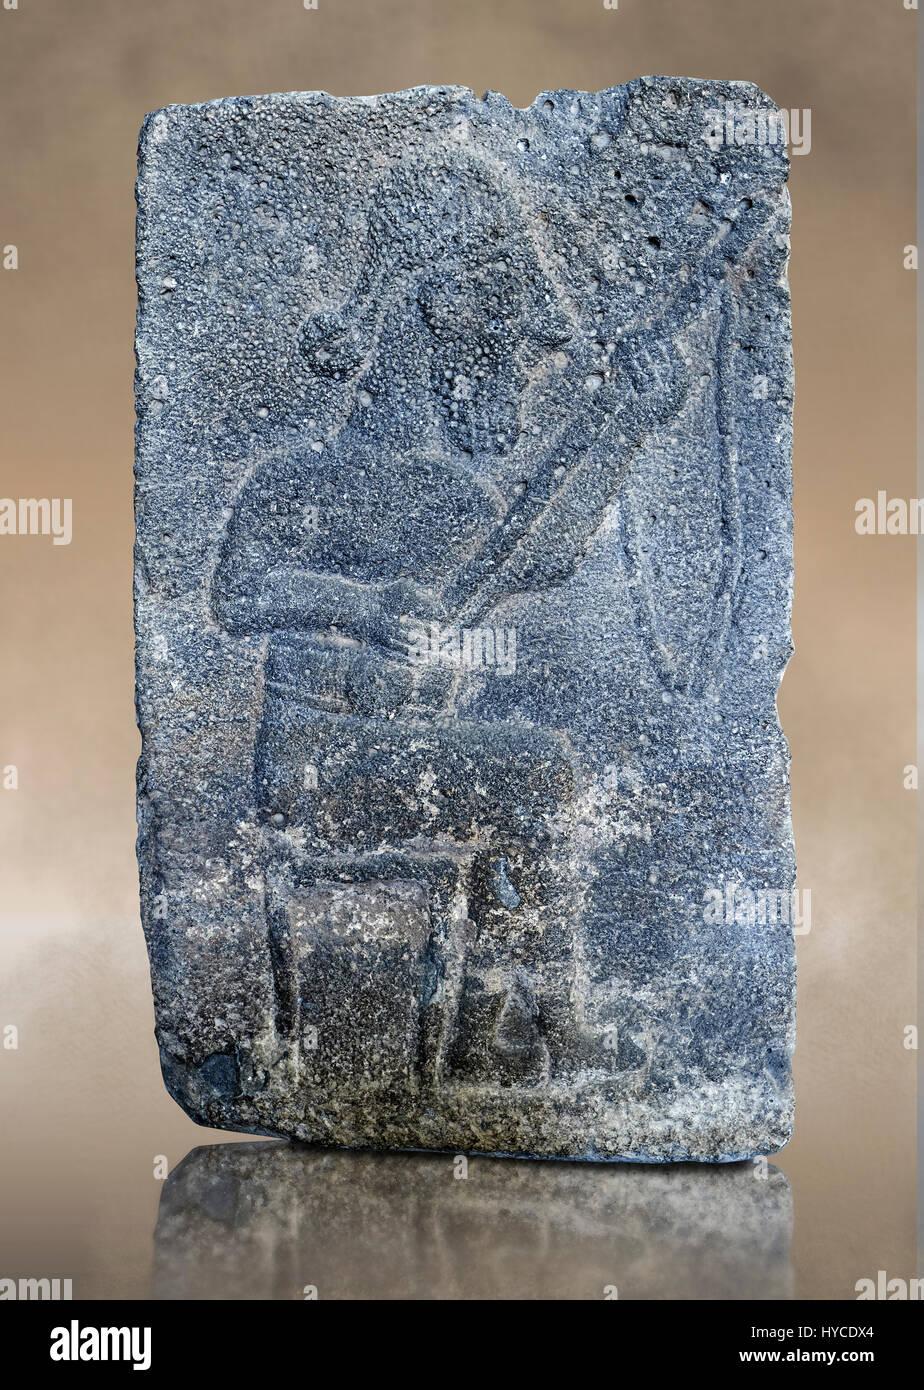 10th - 8th century BC stone Neo-Hittite/ Aramaean Orthostats from the city of Sam'al (Hittite: Yadiya) near Zincirli Stock Photo